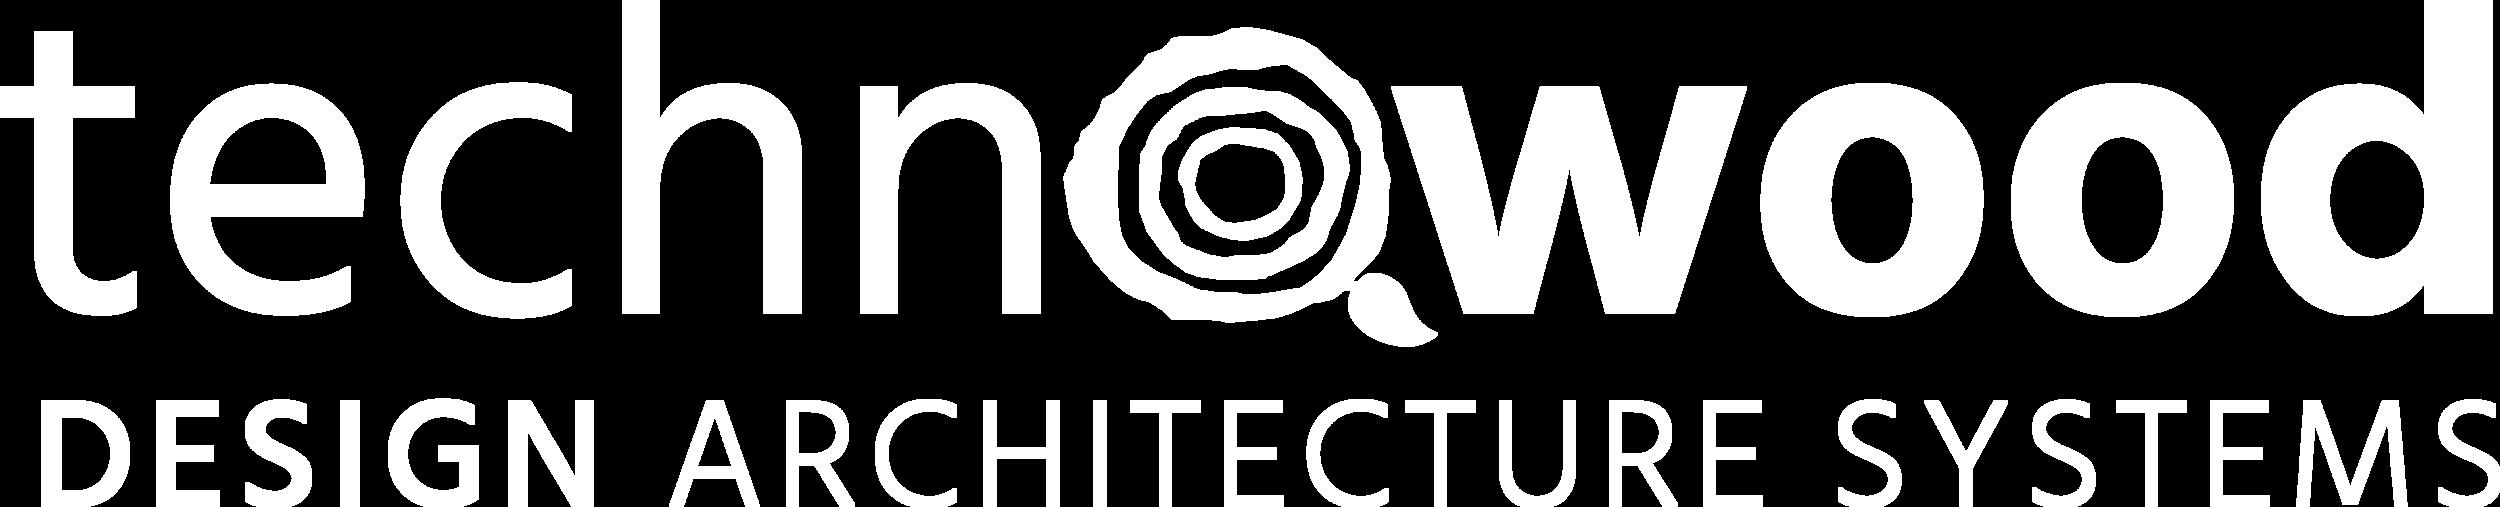 Technowood Vectoral Logo.png